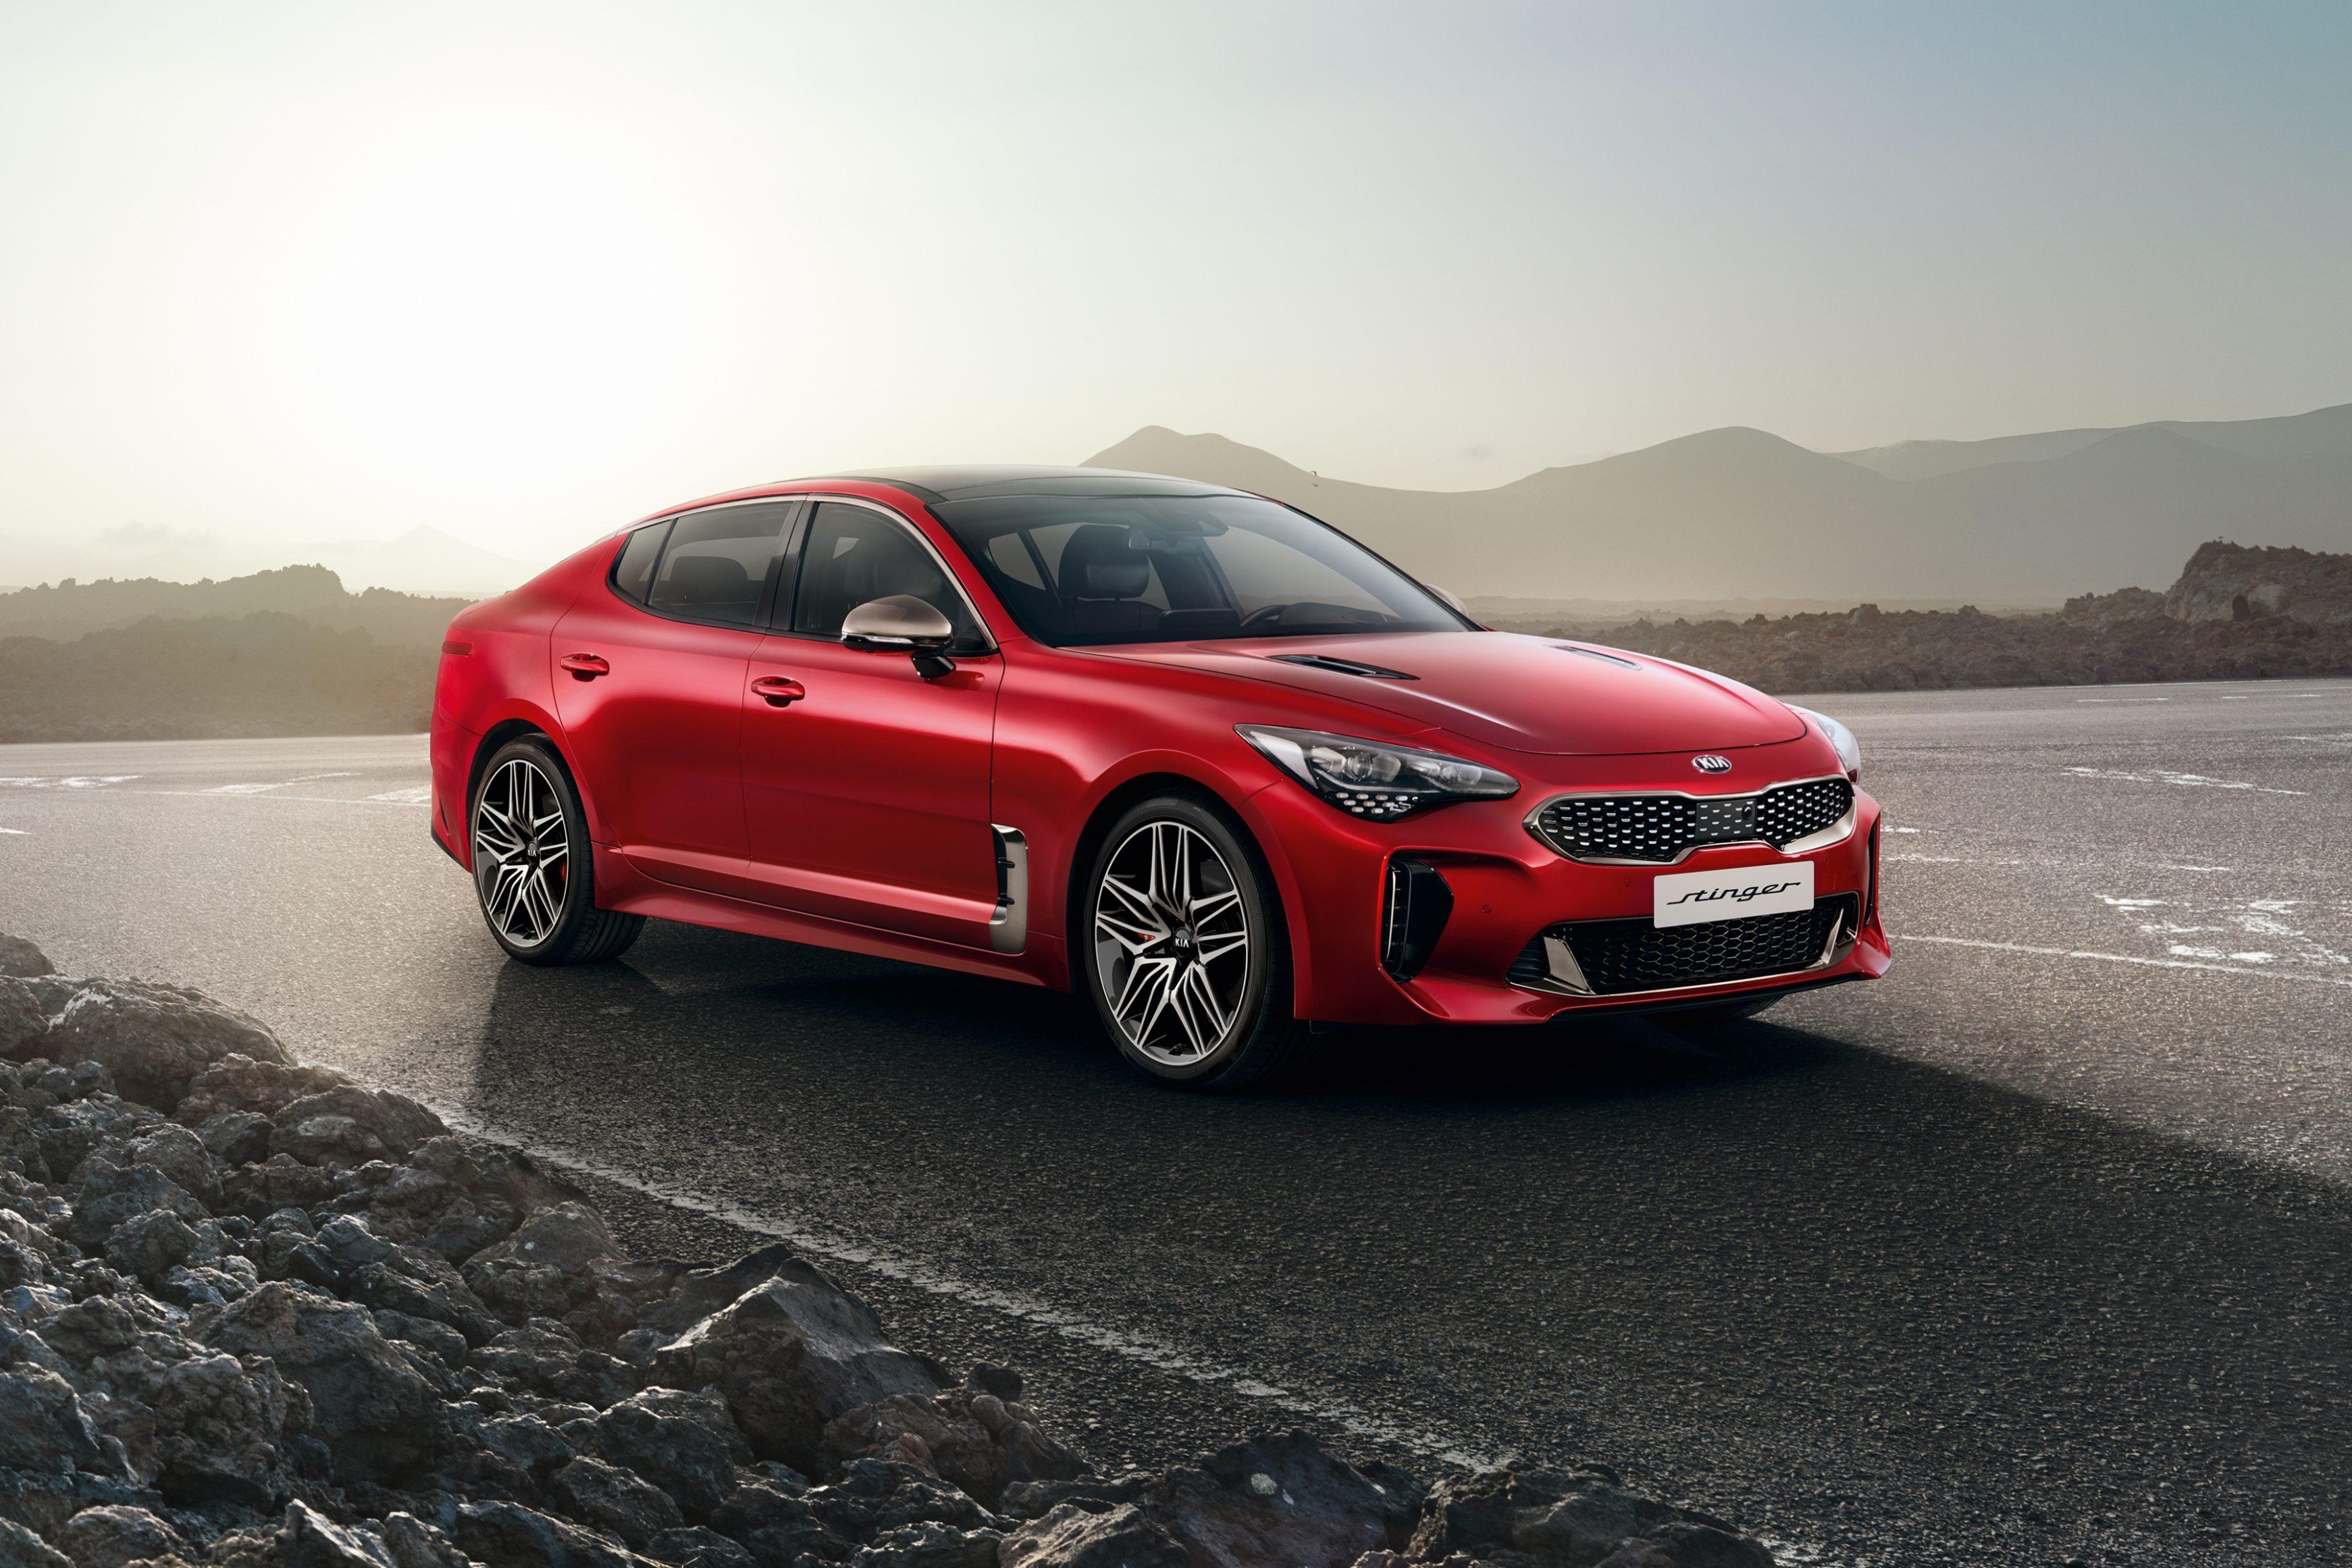 Best affordable sports cars 2021 - Kia Stinger